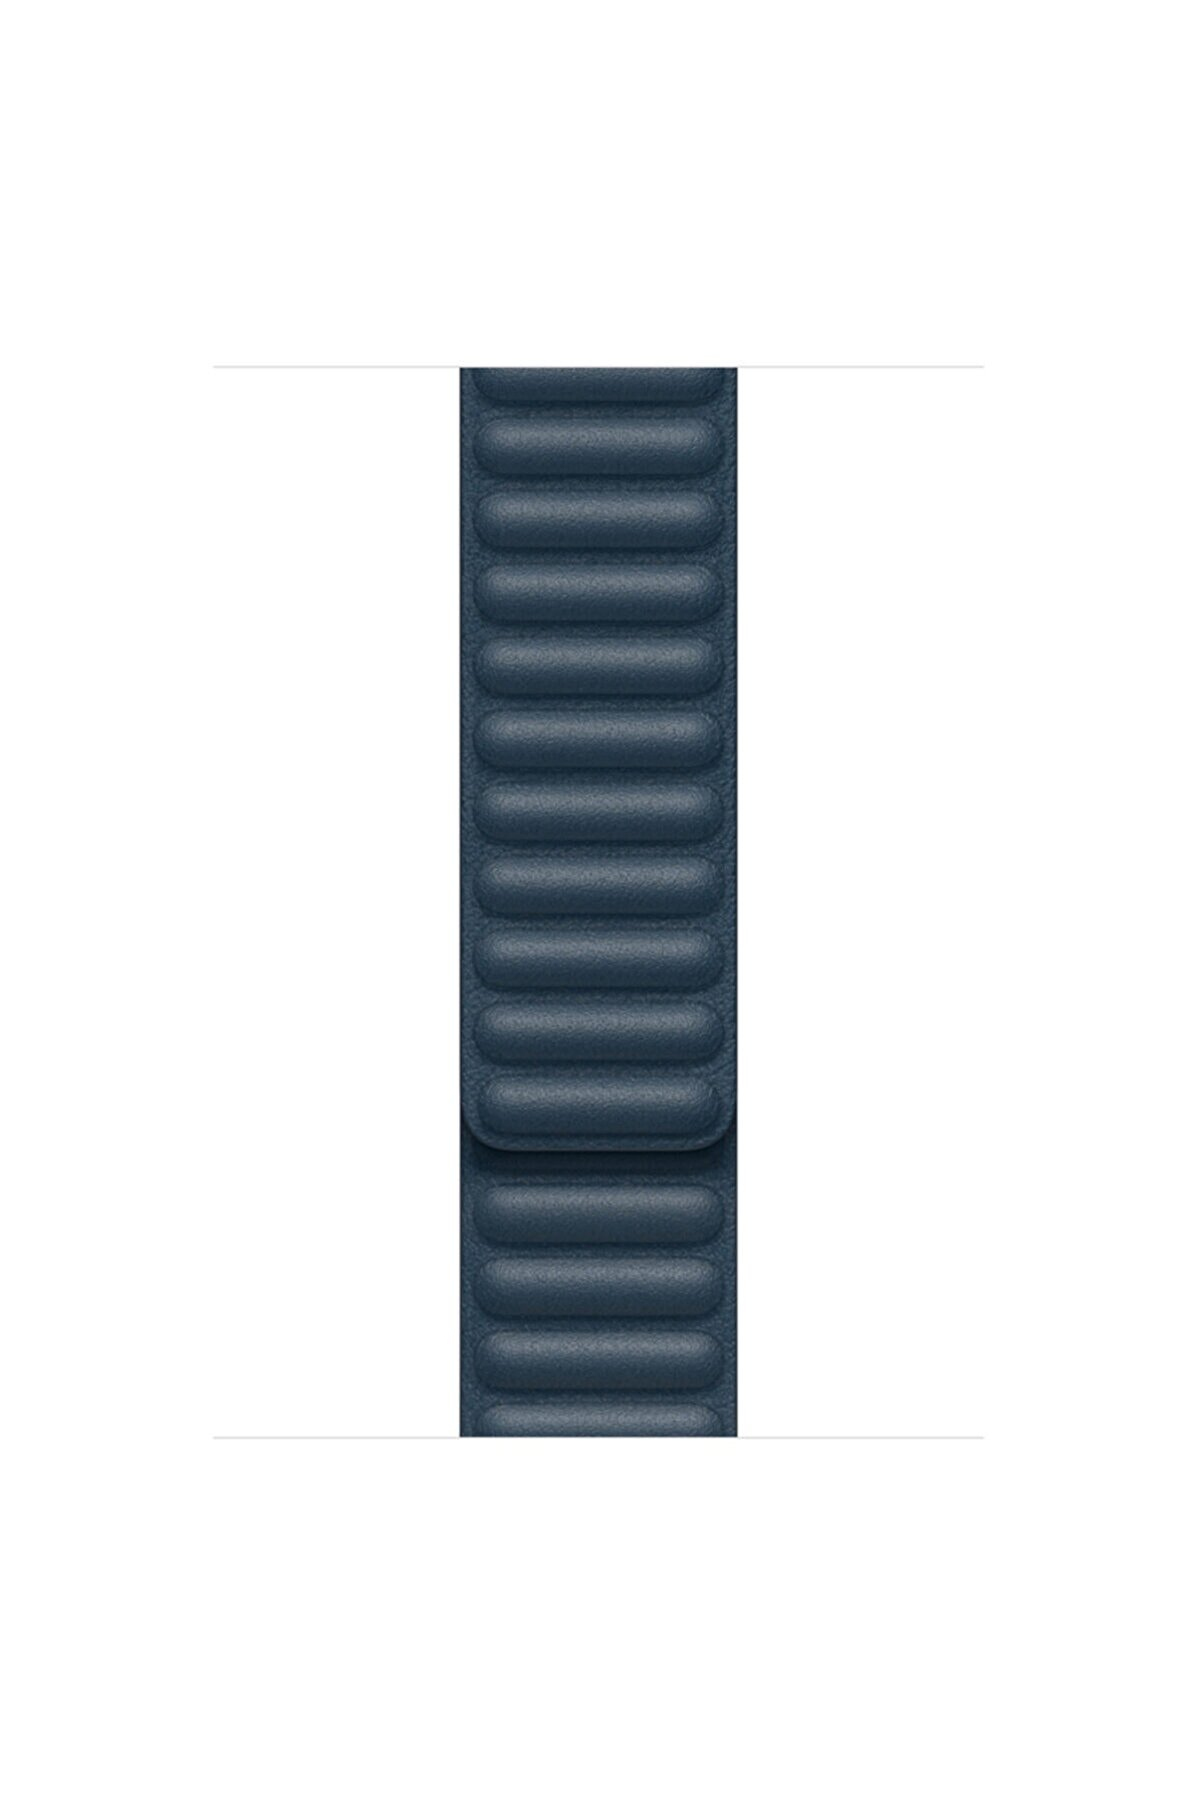 Microsonic Microsonic Watch Series 3 38mm UyumluKordon Leather Link Band Lacivert